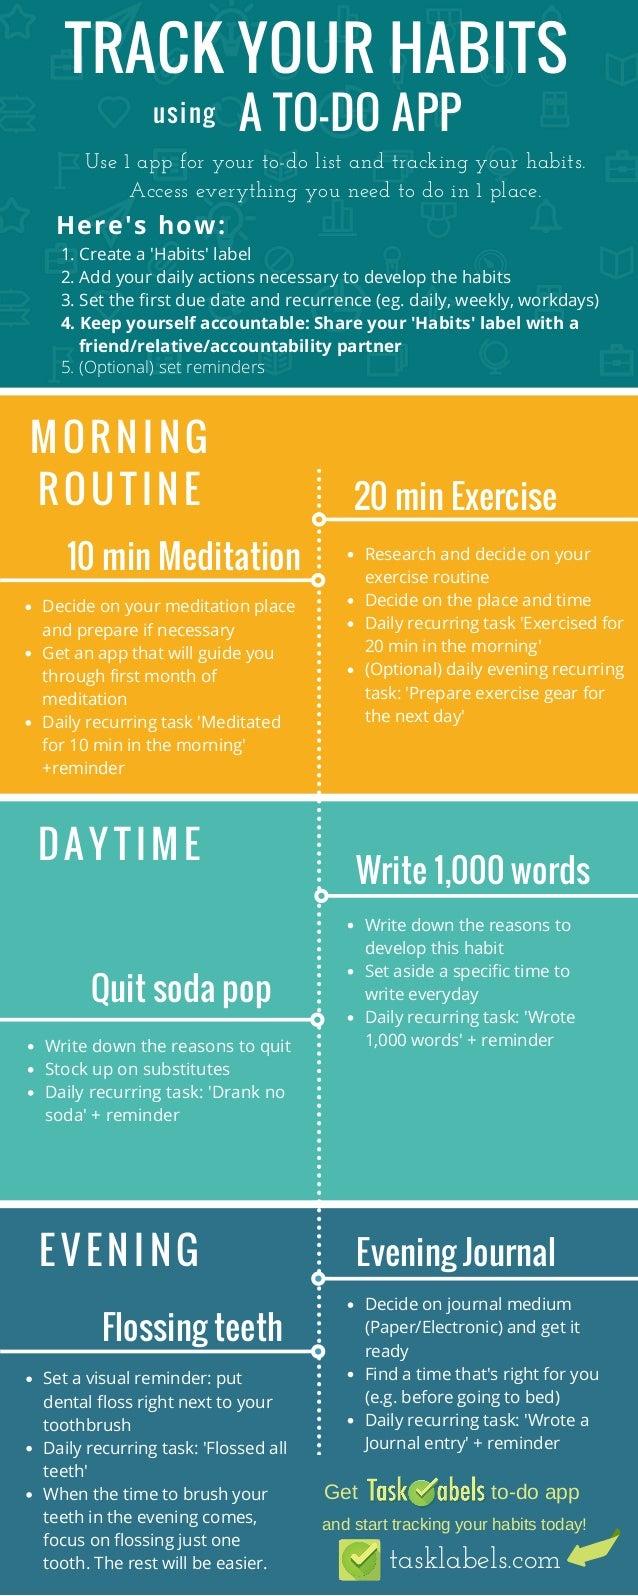 TRACK YOUR HABITS 20 min Exercise MORNI NG ROUTI NE Use1appforyourto-dolistandtrackingyourhabits. Accesseveryth...